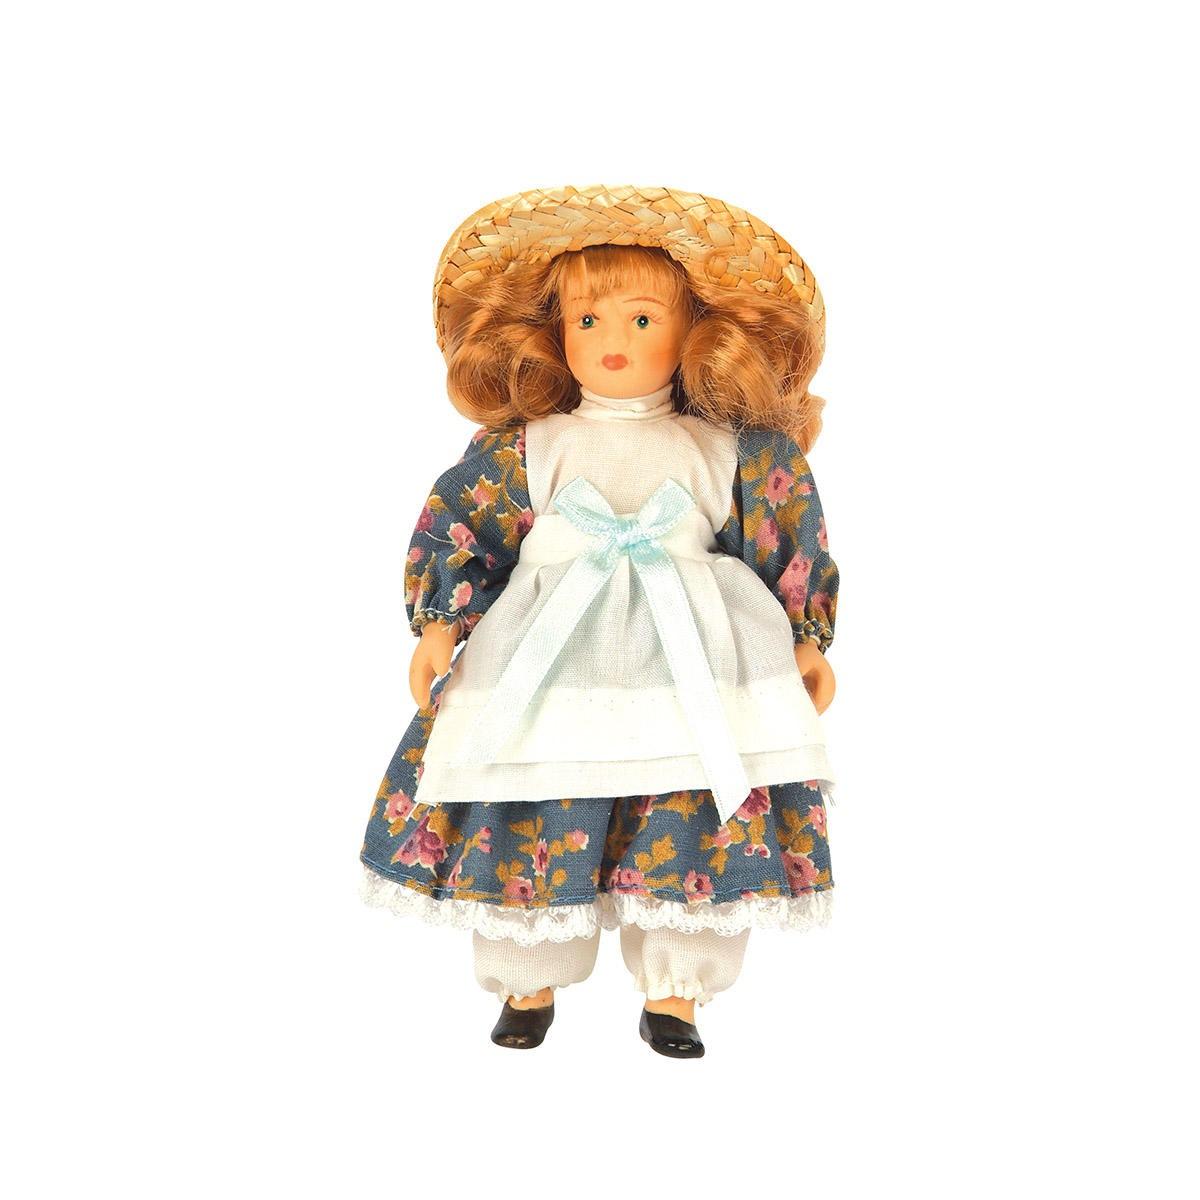 Streets Ahead Porcelain Doll